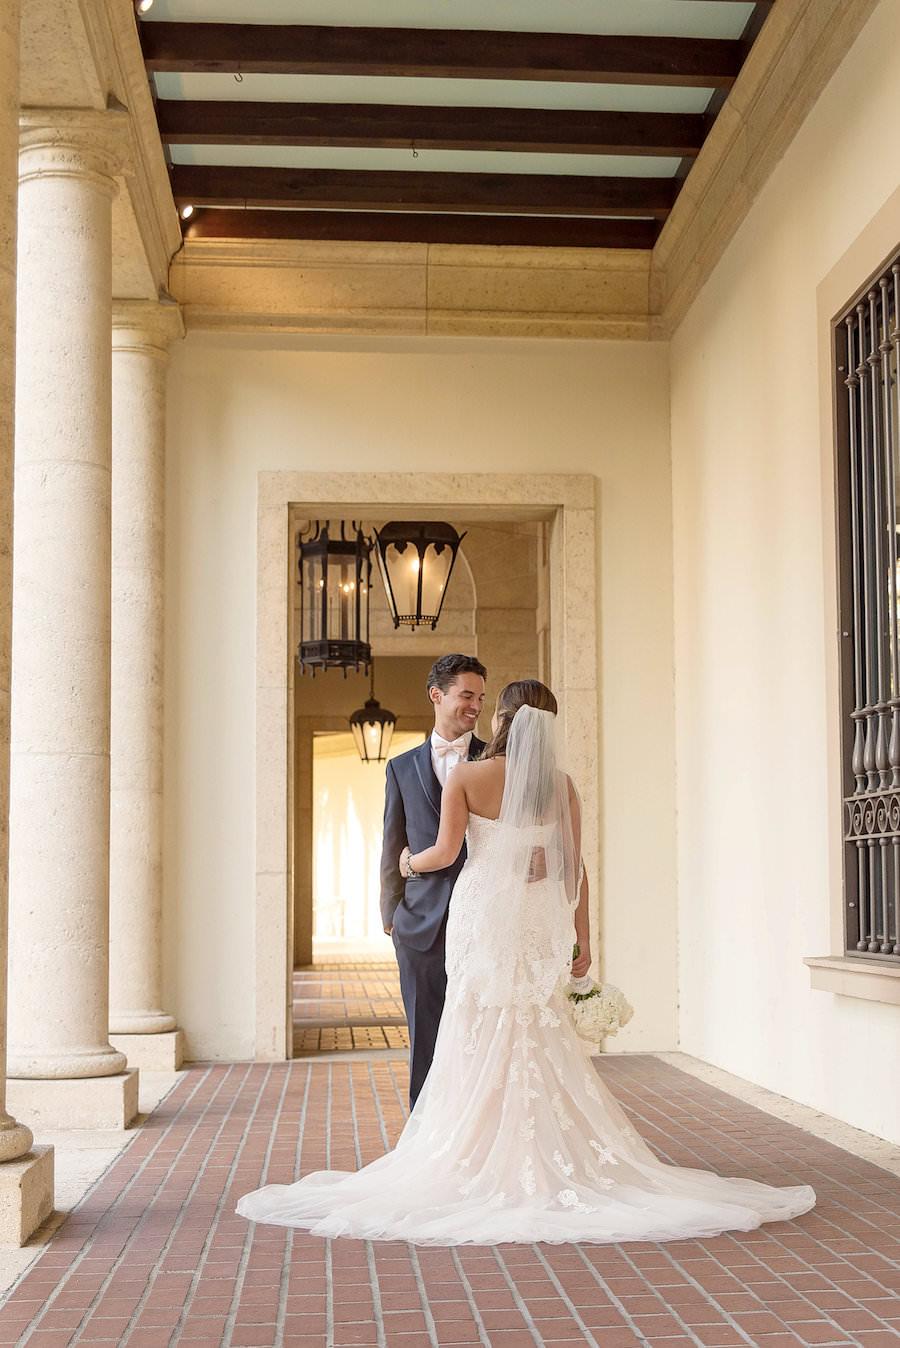 Bride and Groom Wedding Portrait in Sweetheart Lace Stella York Wedding Dress | St Petersburg Wedding Venue Museum of Fine Arts St Pete | Tampa Bay Photographer Kristen Marie Photography